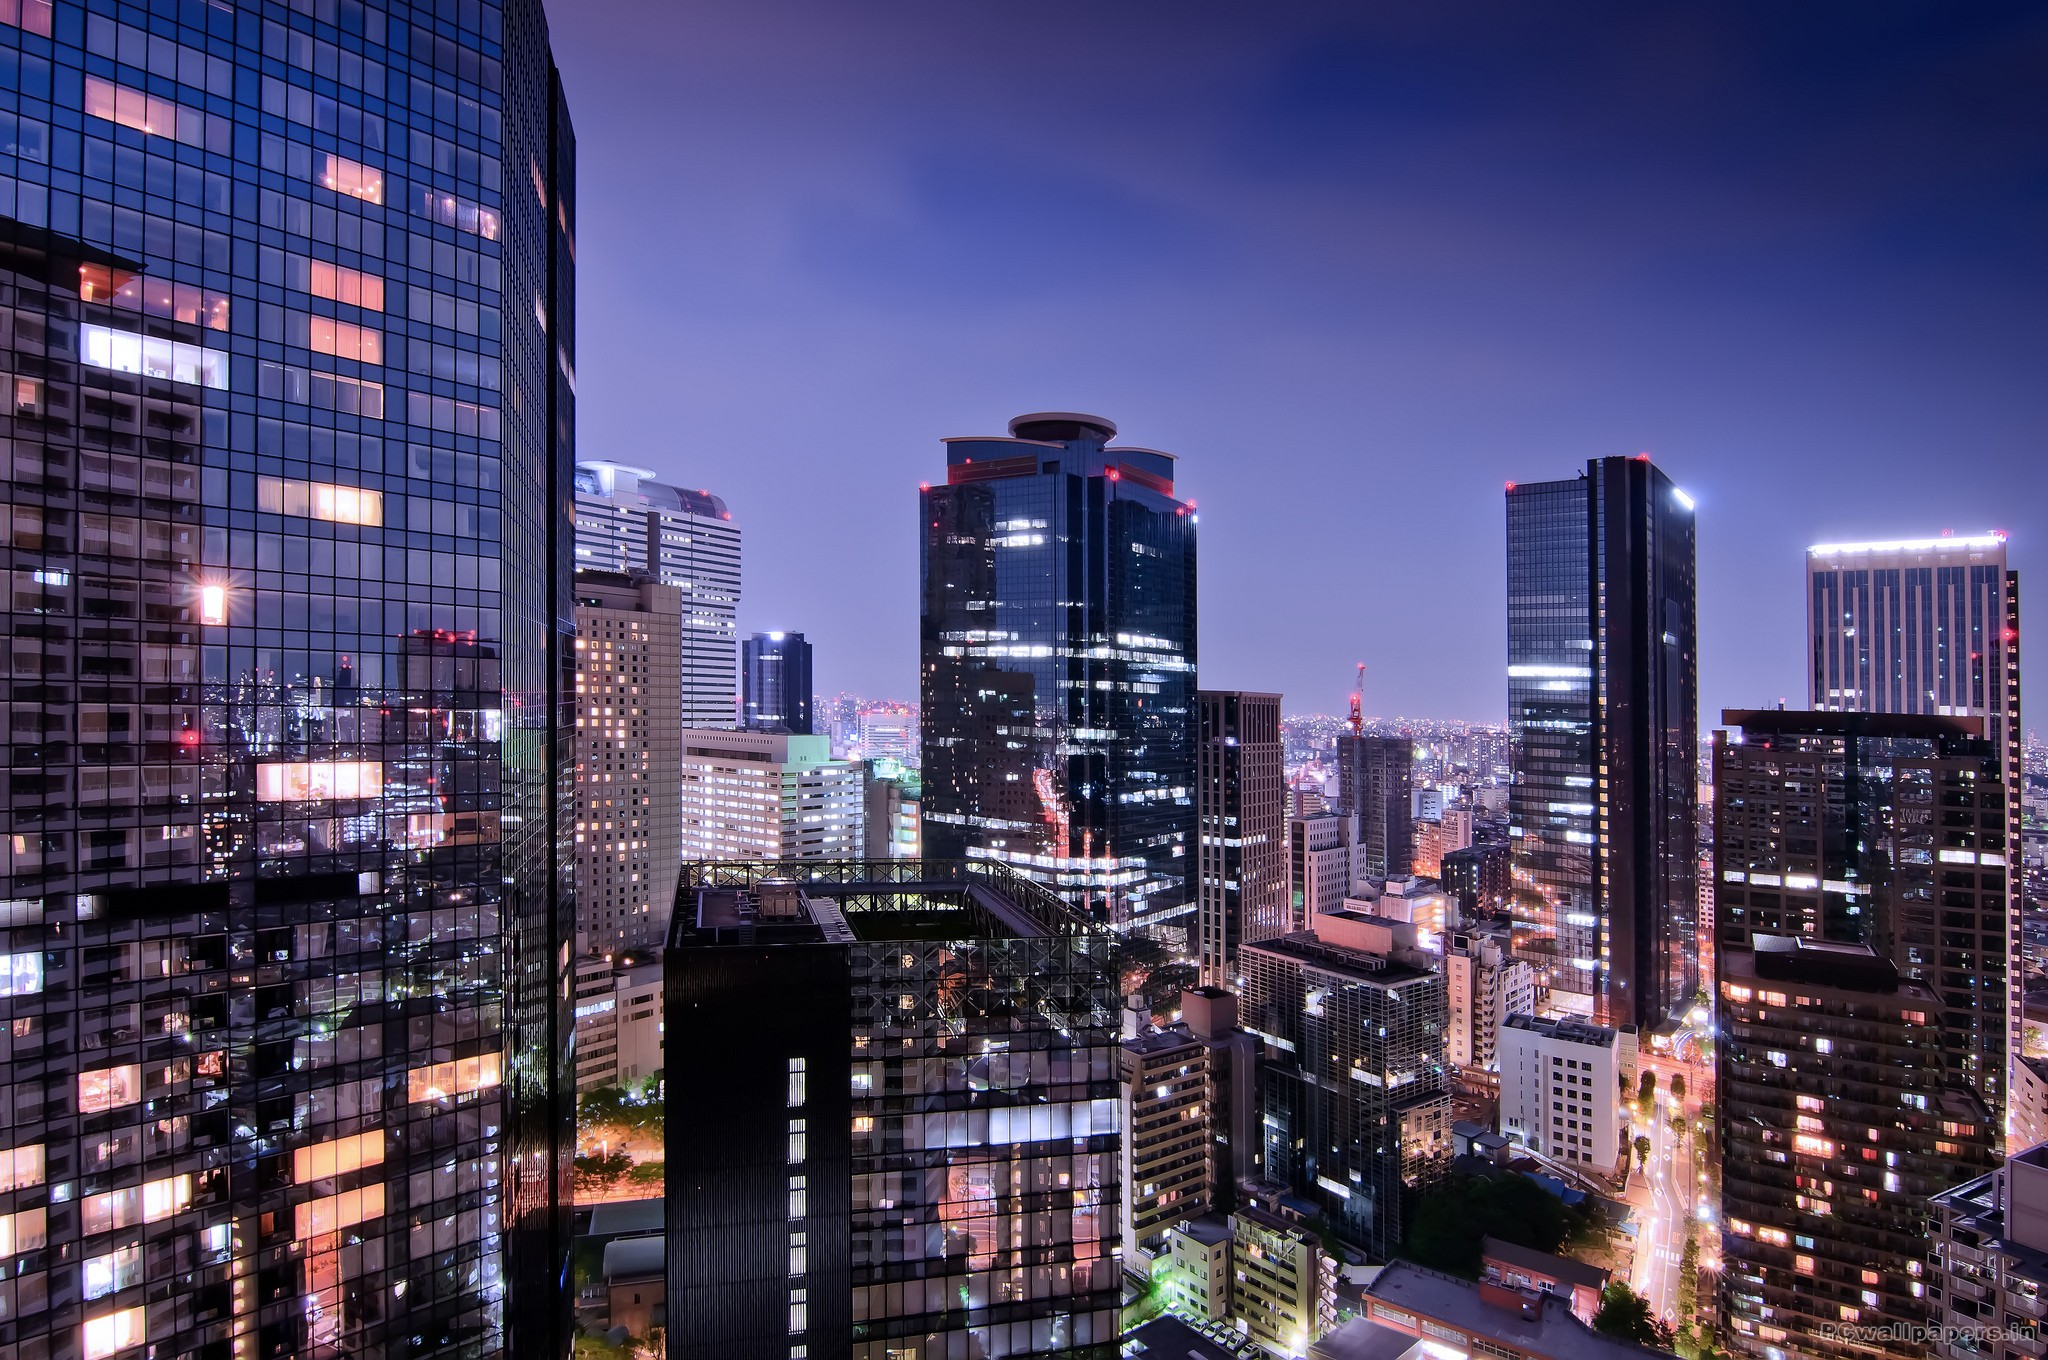 Download Tokyo Background 24392 2048x1360 px High Resolution